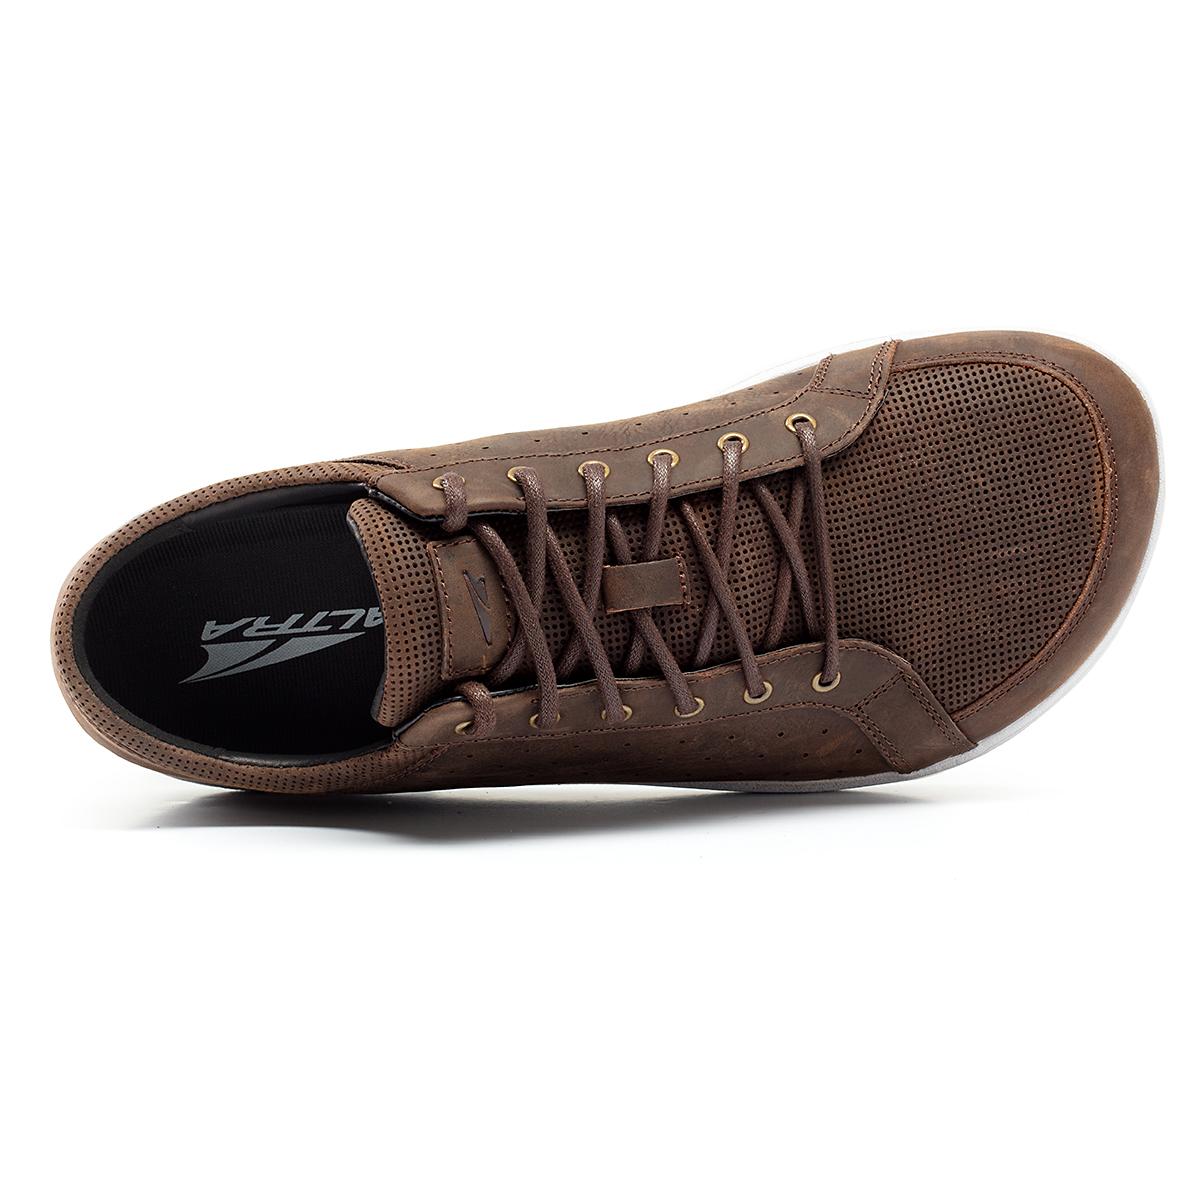 Men's Altra Cayd Lifestyle Shoe - Color: Brown (Regular Width) - Size: 10, Brown, large, image 3